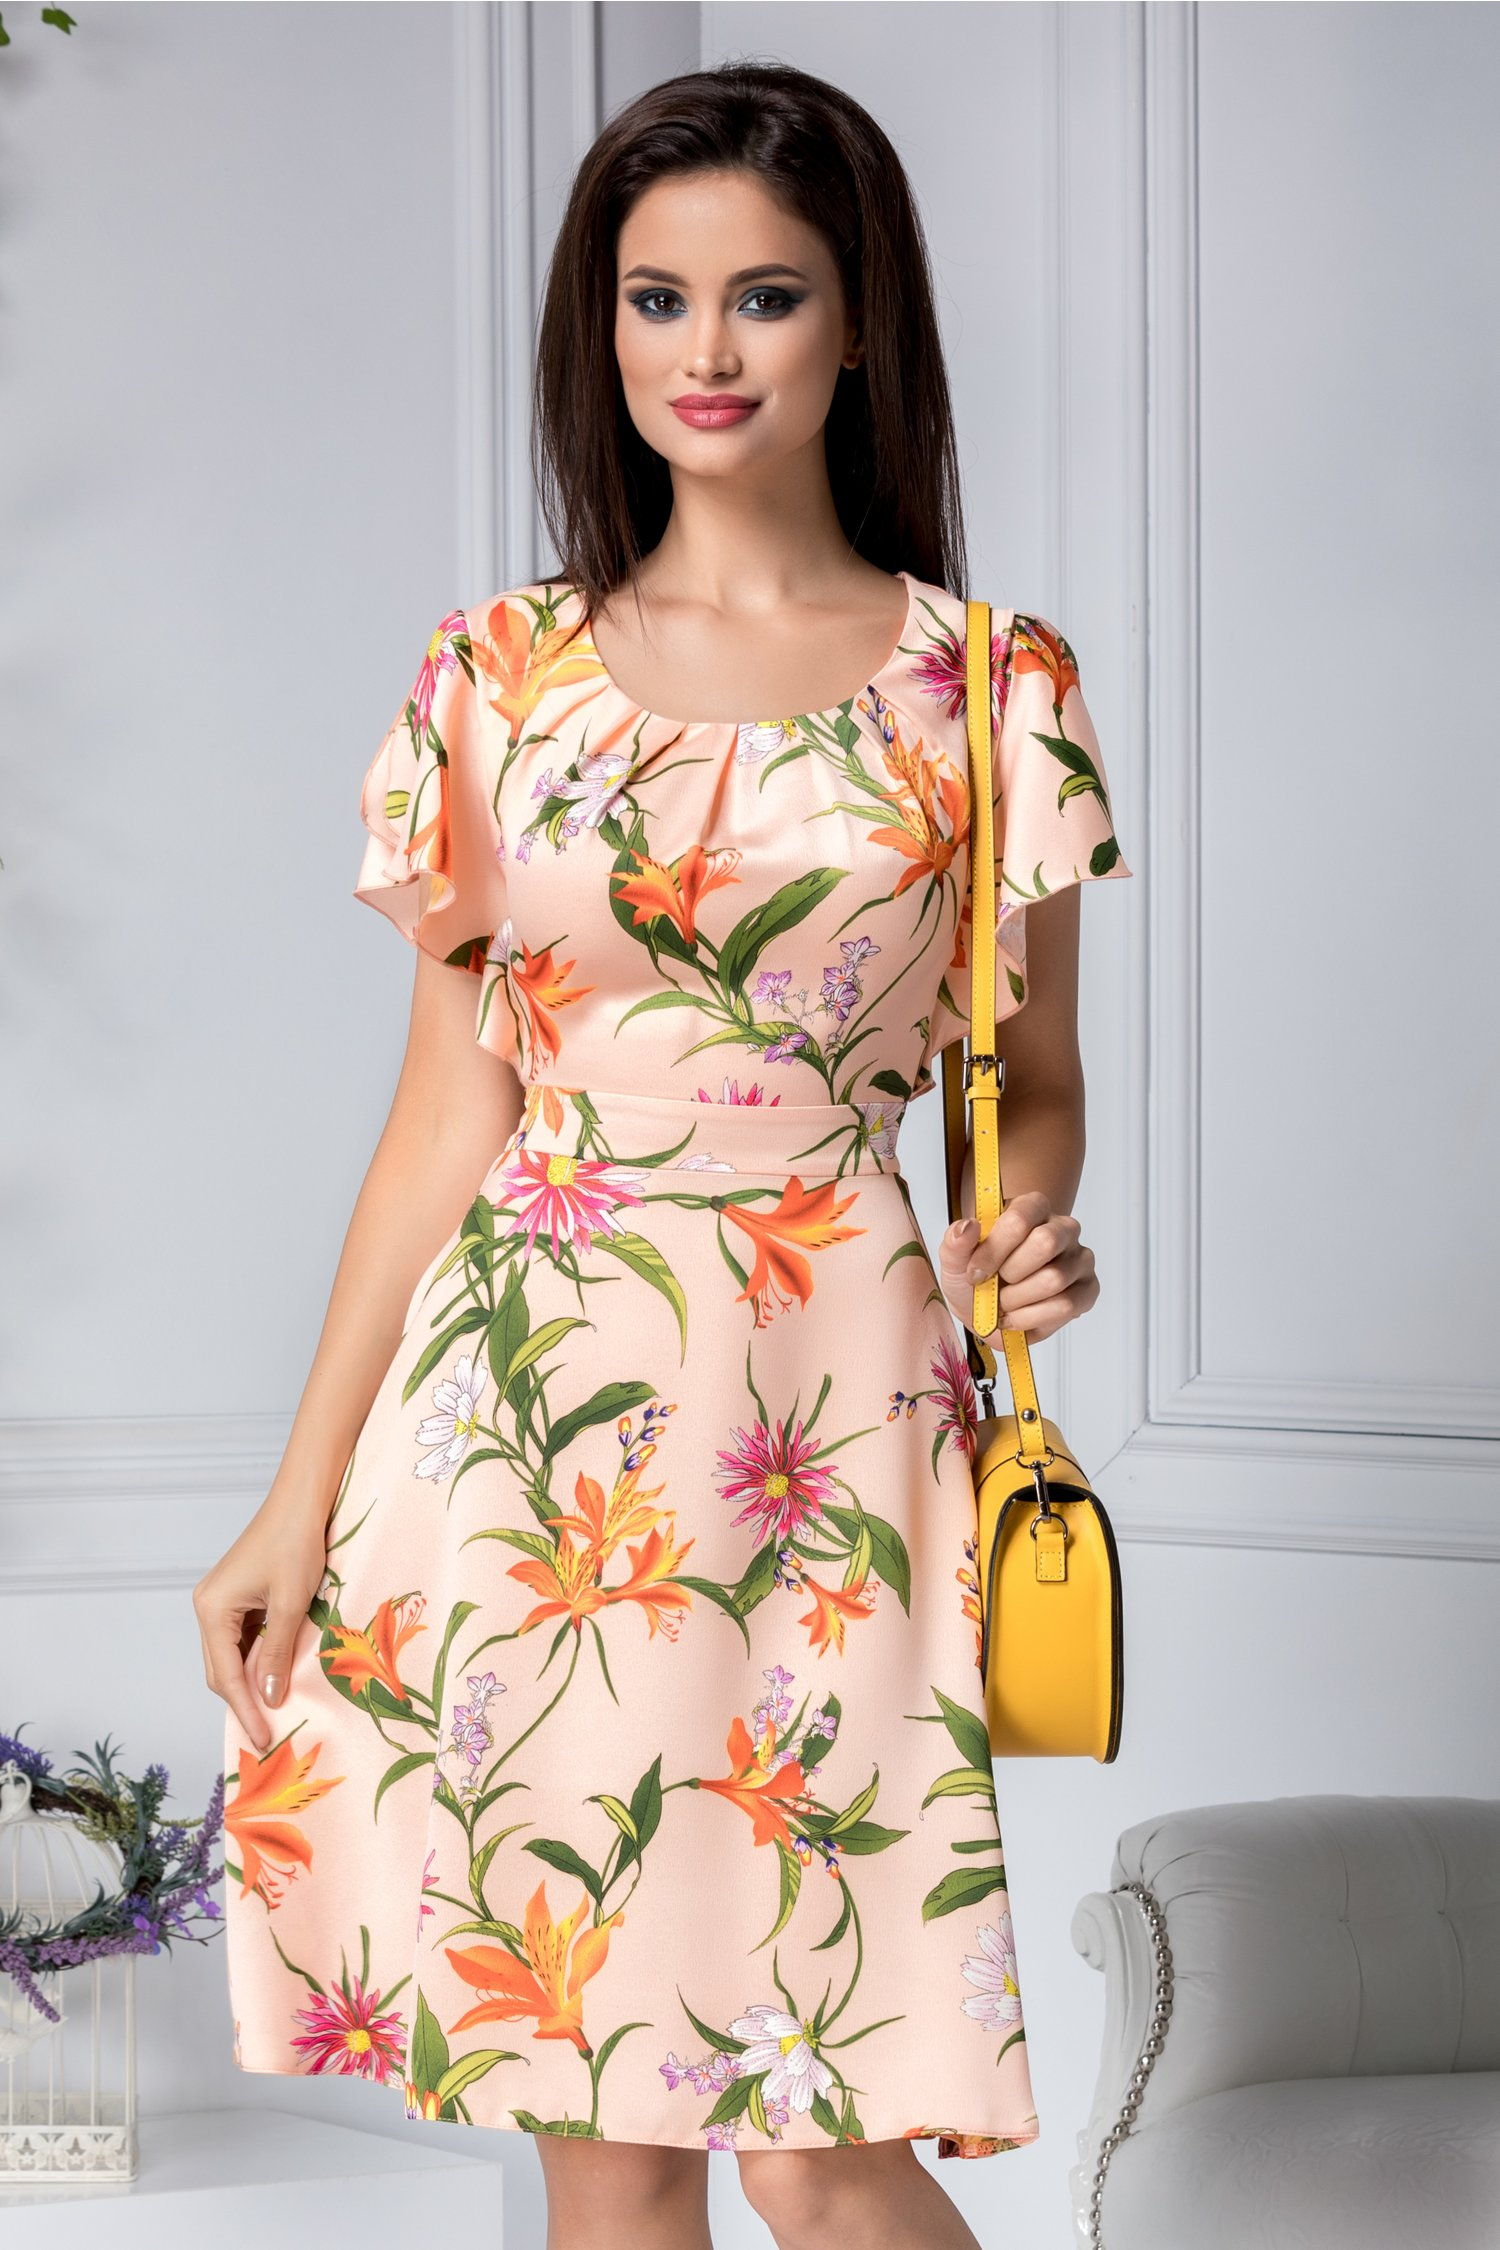 Rochie Sorana somon cu imprimeu floral orange